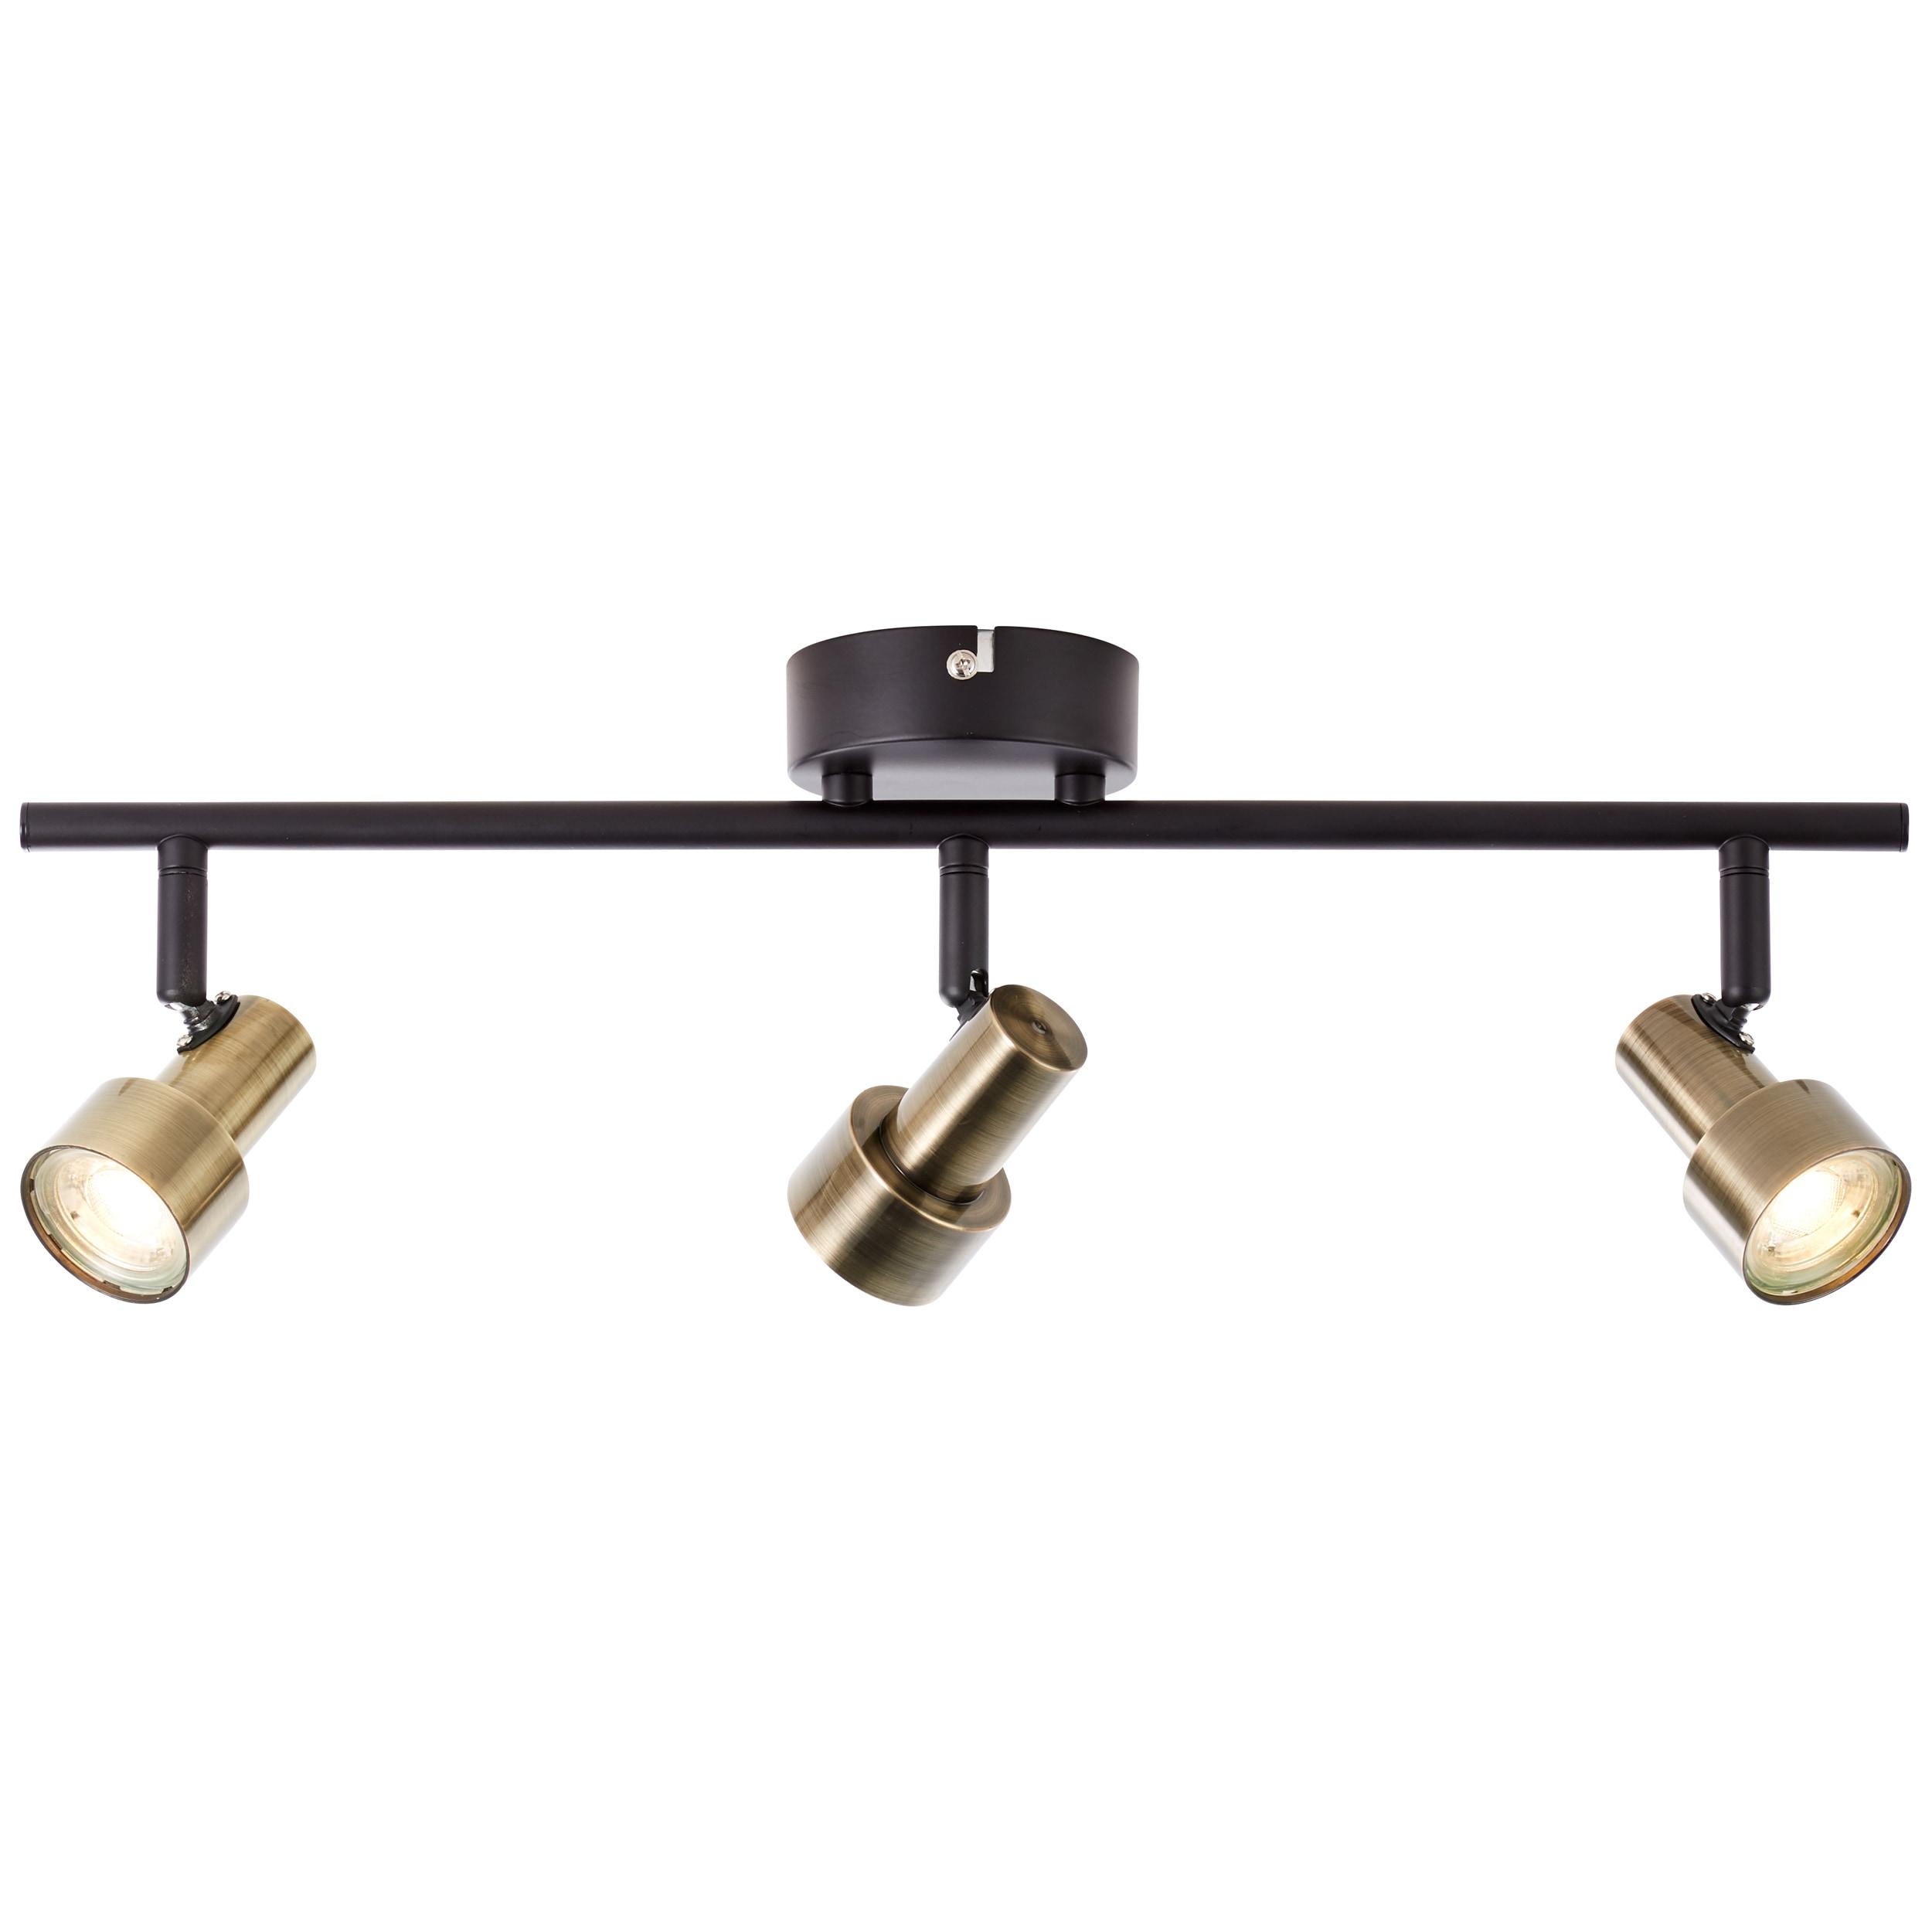 Brilliant Leuchten Croyden LED Spotrohr 3flg messing/schwarz